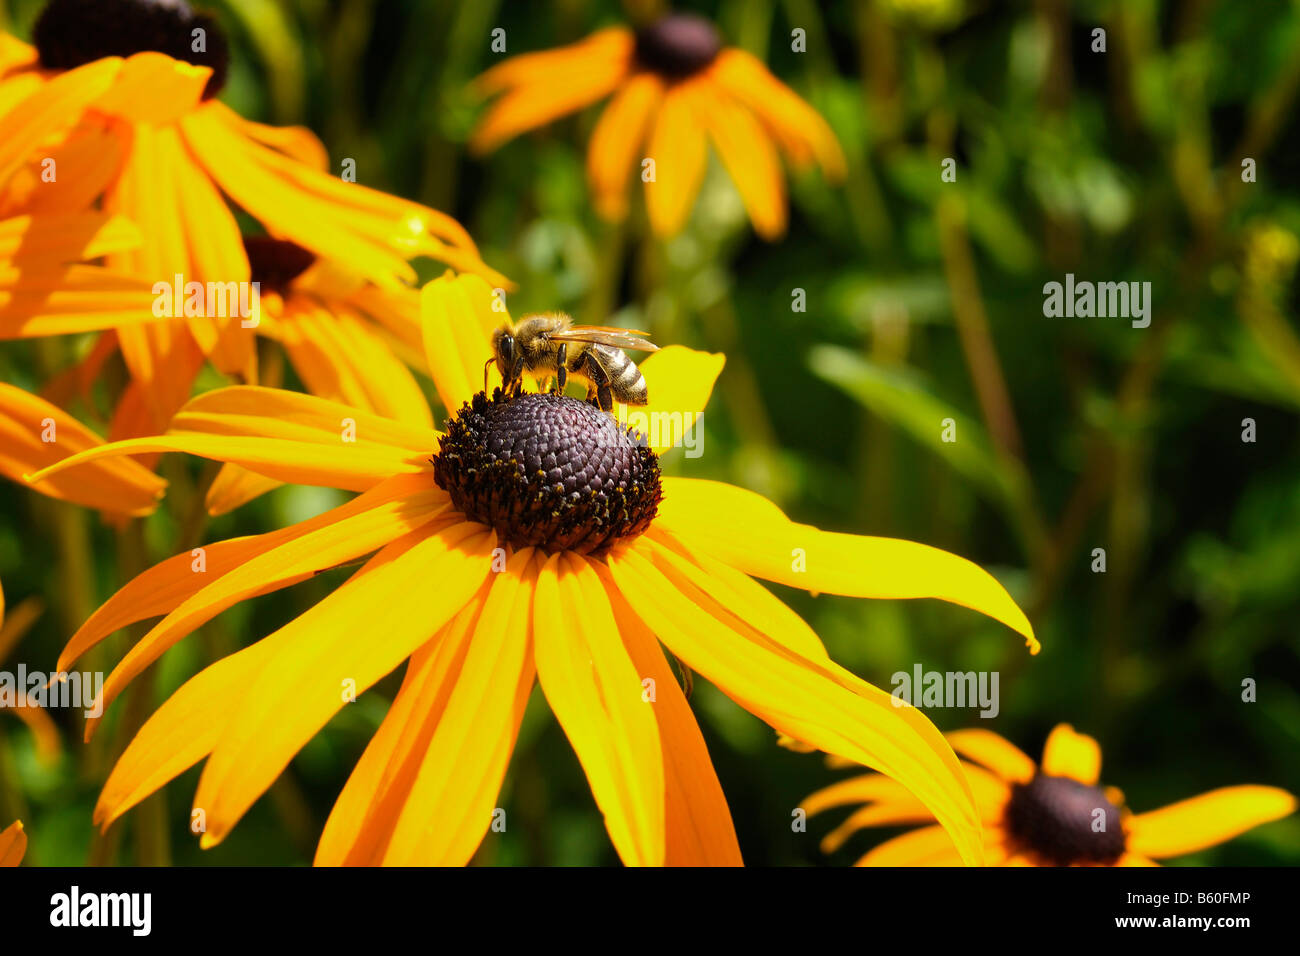 Showy Coneflower (Rudbeckia speciosa) with a bee - Stock Image